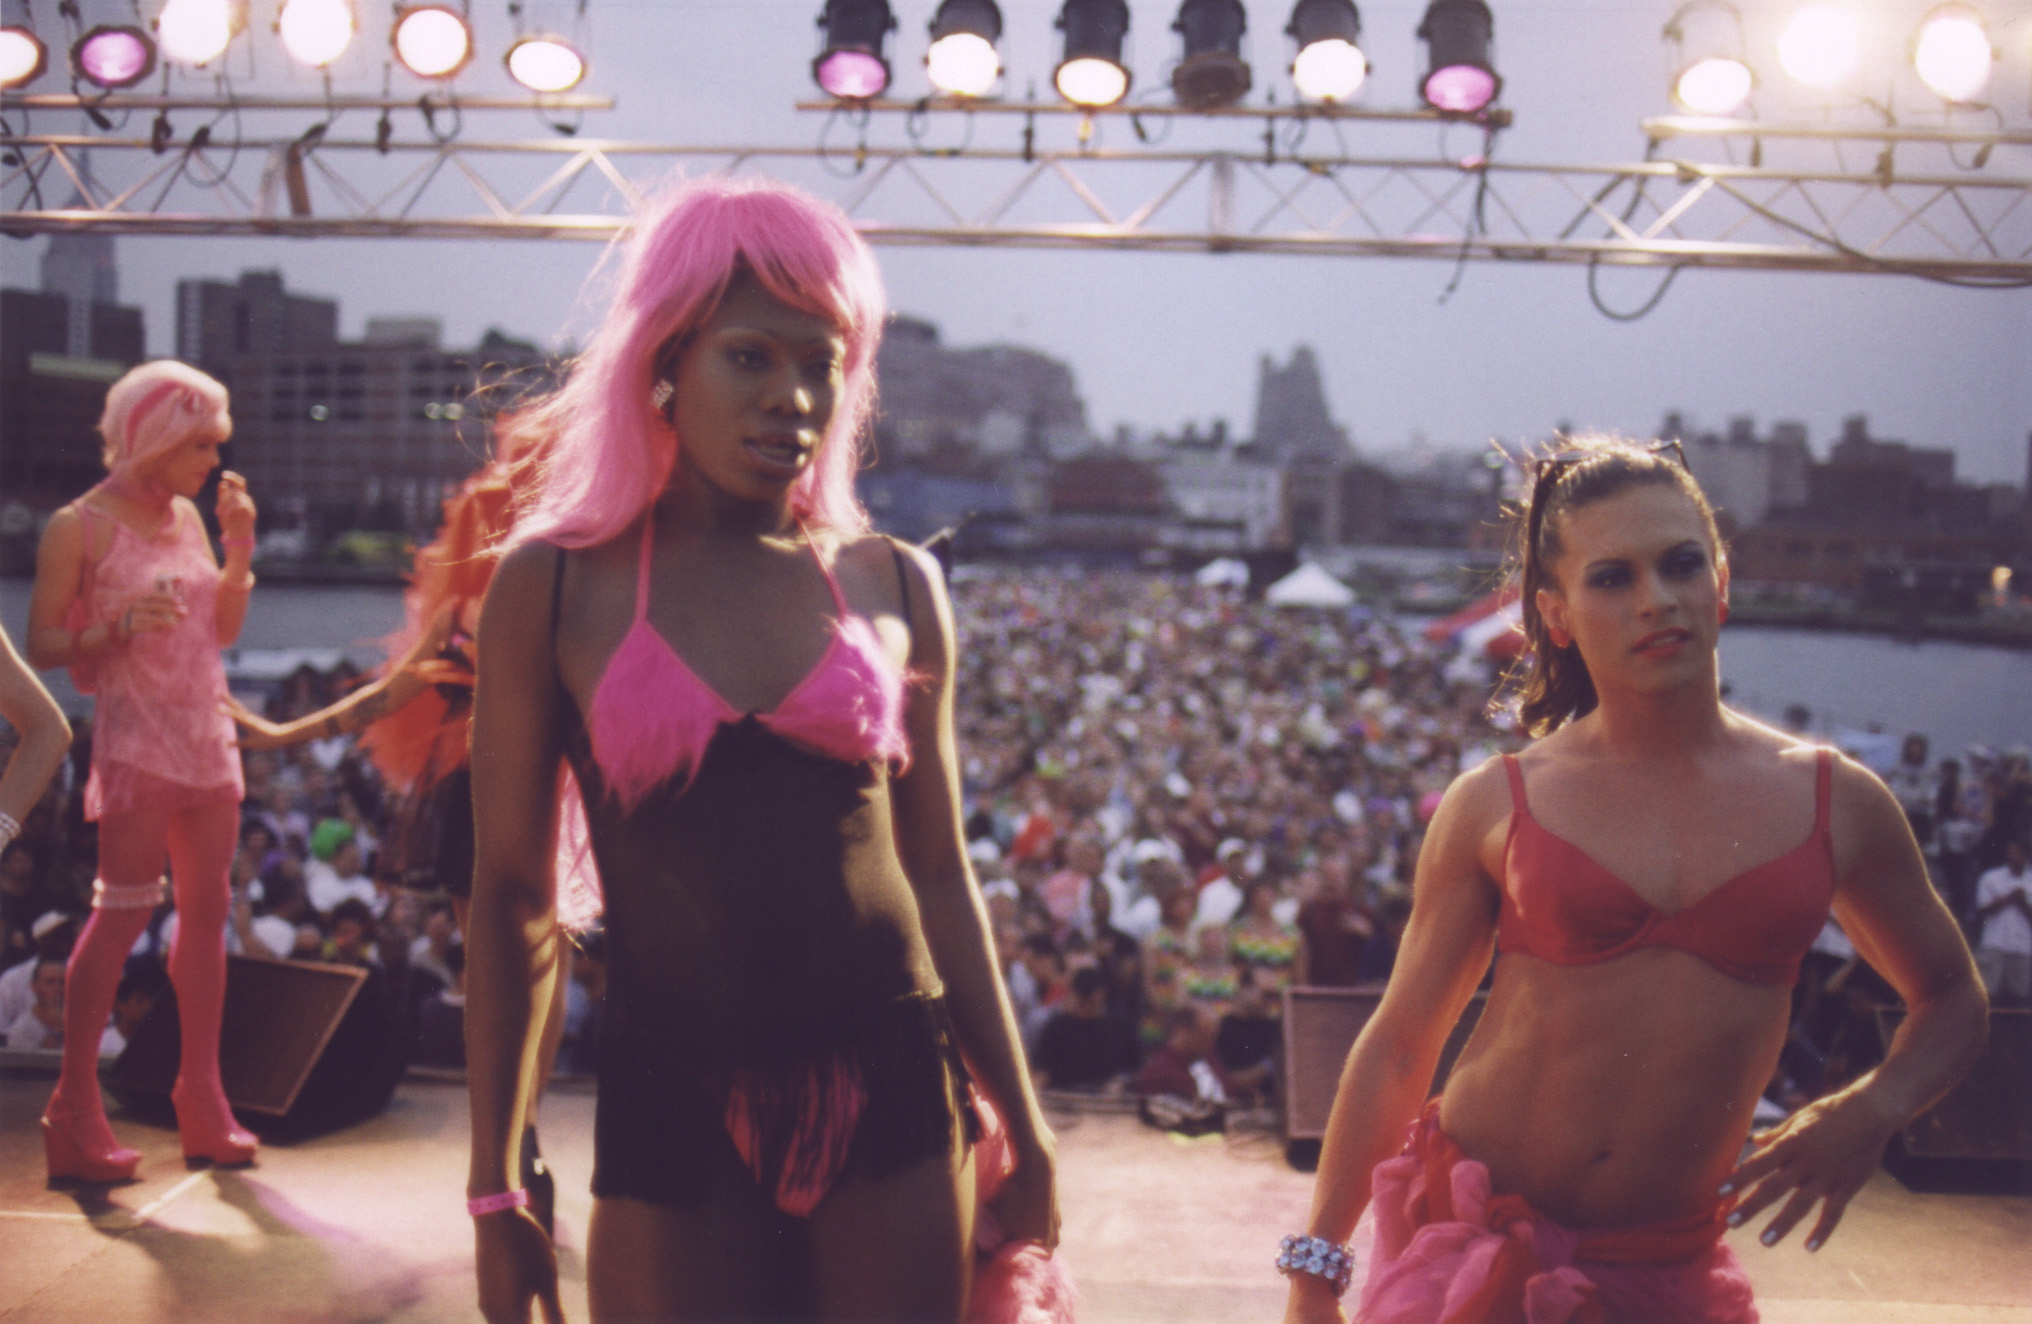 Photo by Jerome Albertini, 1997